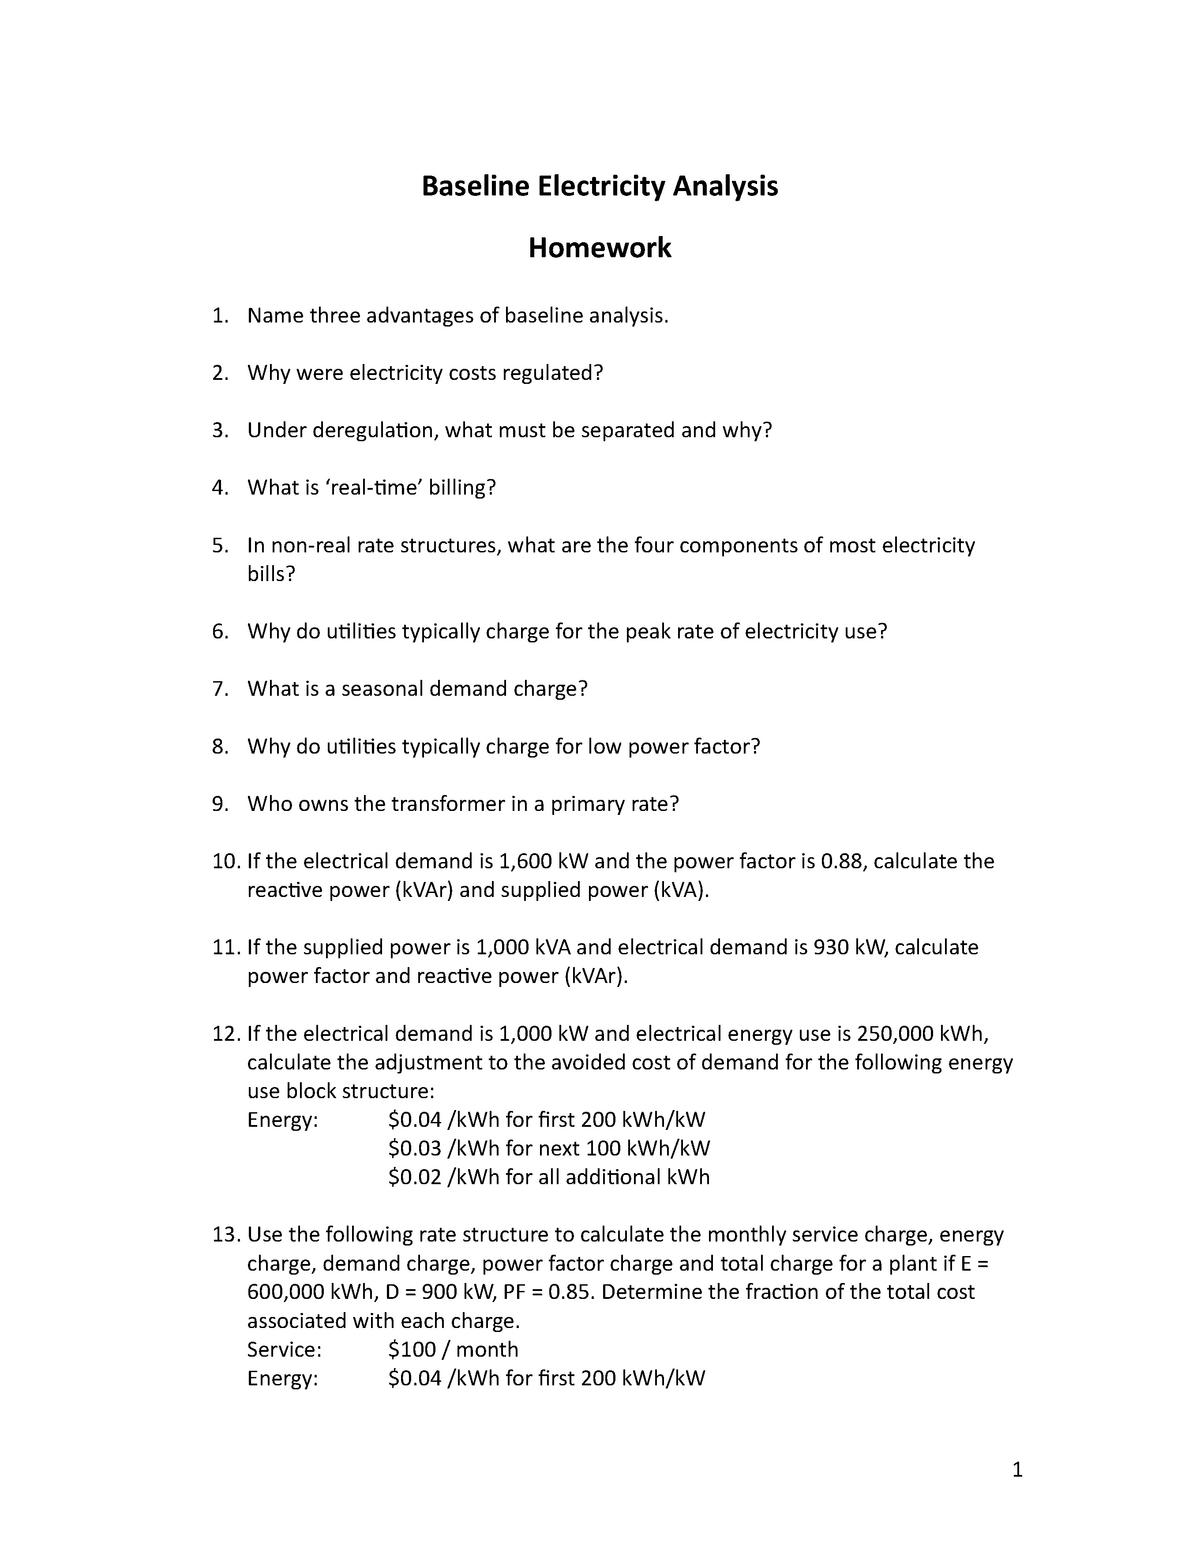 2009-2010 Homework 1 - Baseline Electricity Analysis - MEE 478